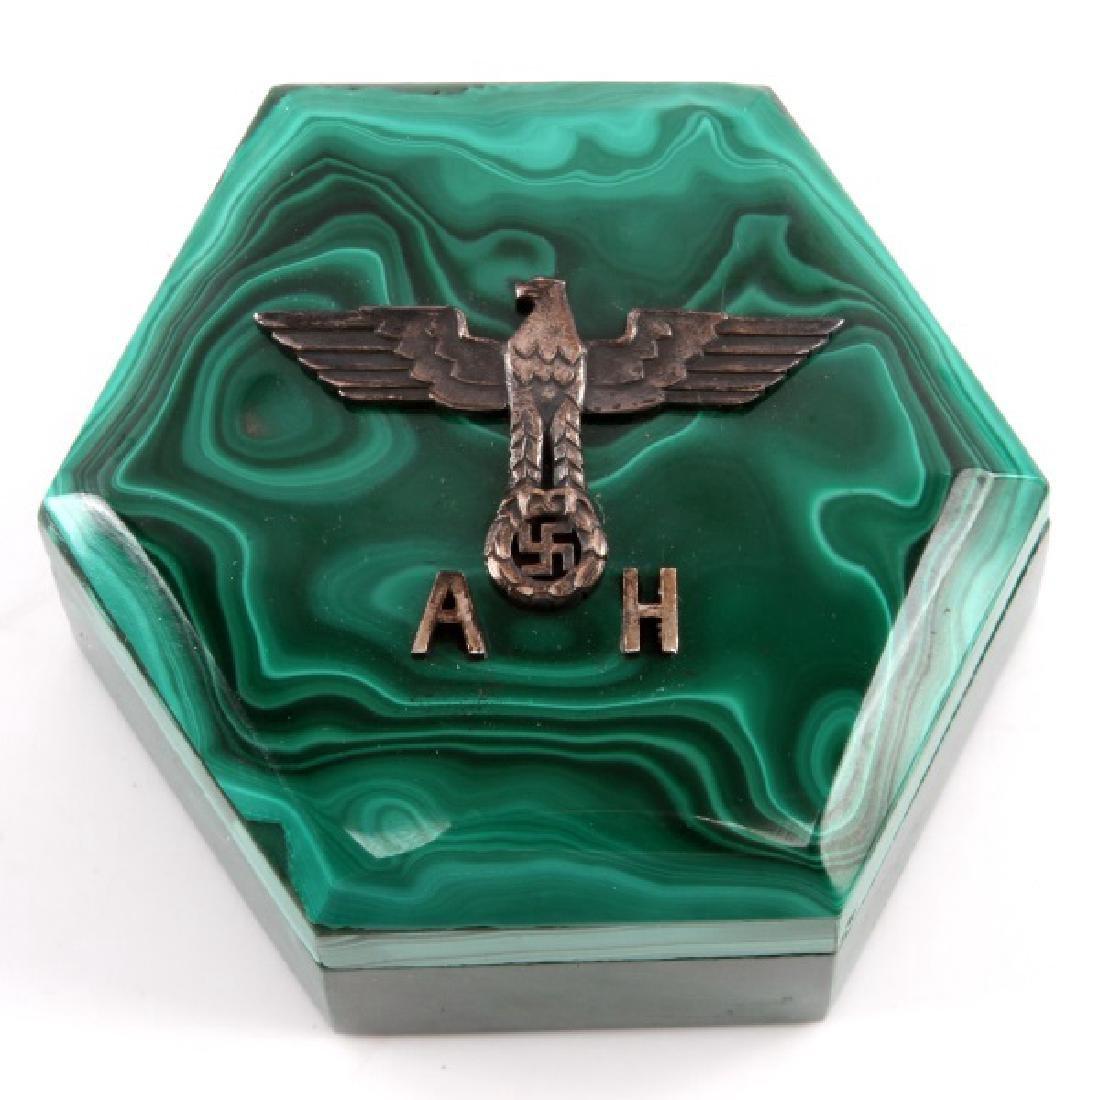 ADOLF HITLER MALACHITE TRINKET BOX GERMAN WWII